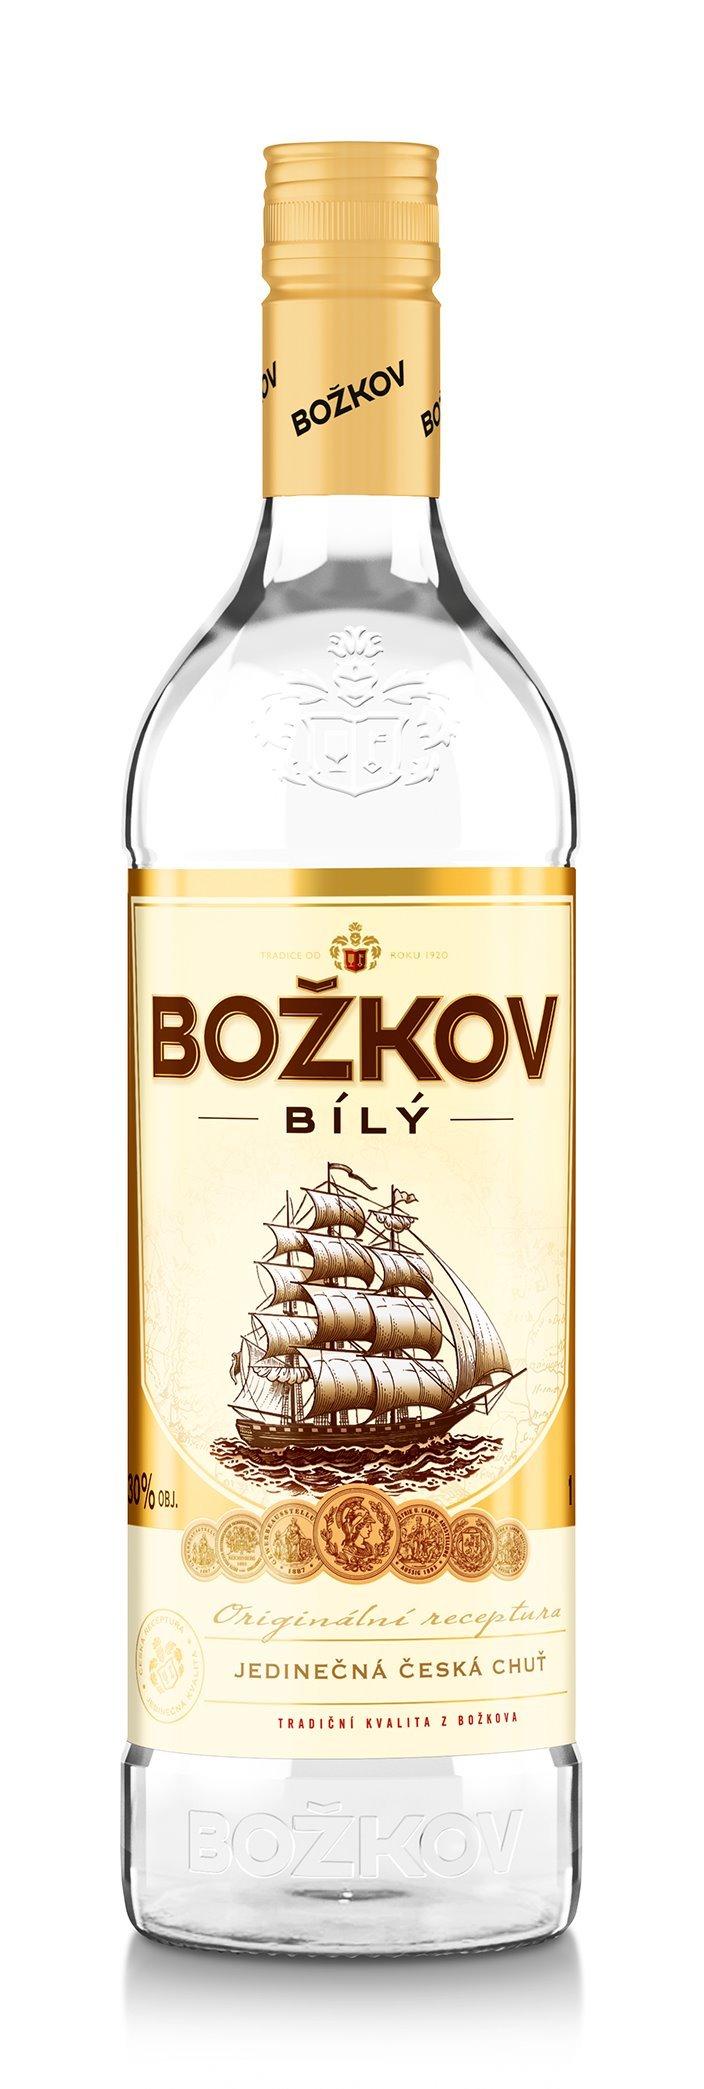 Rum Božkov bílý 500 ml - samostatně neprodejné